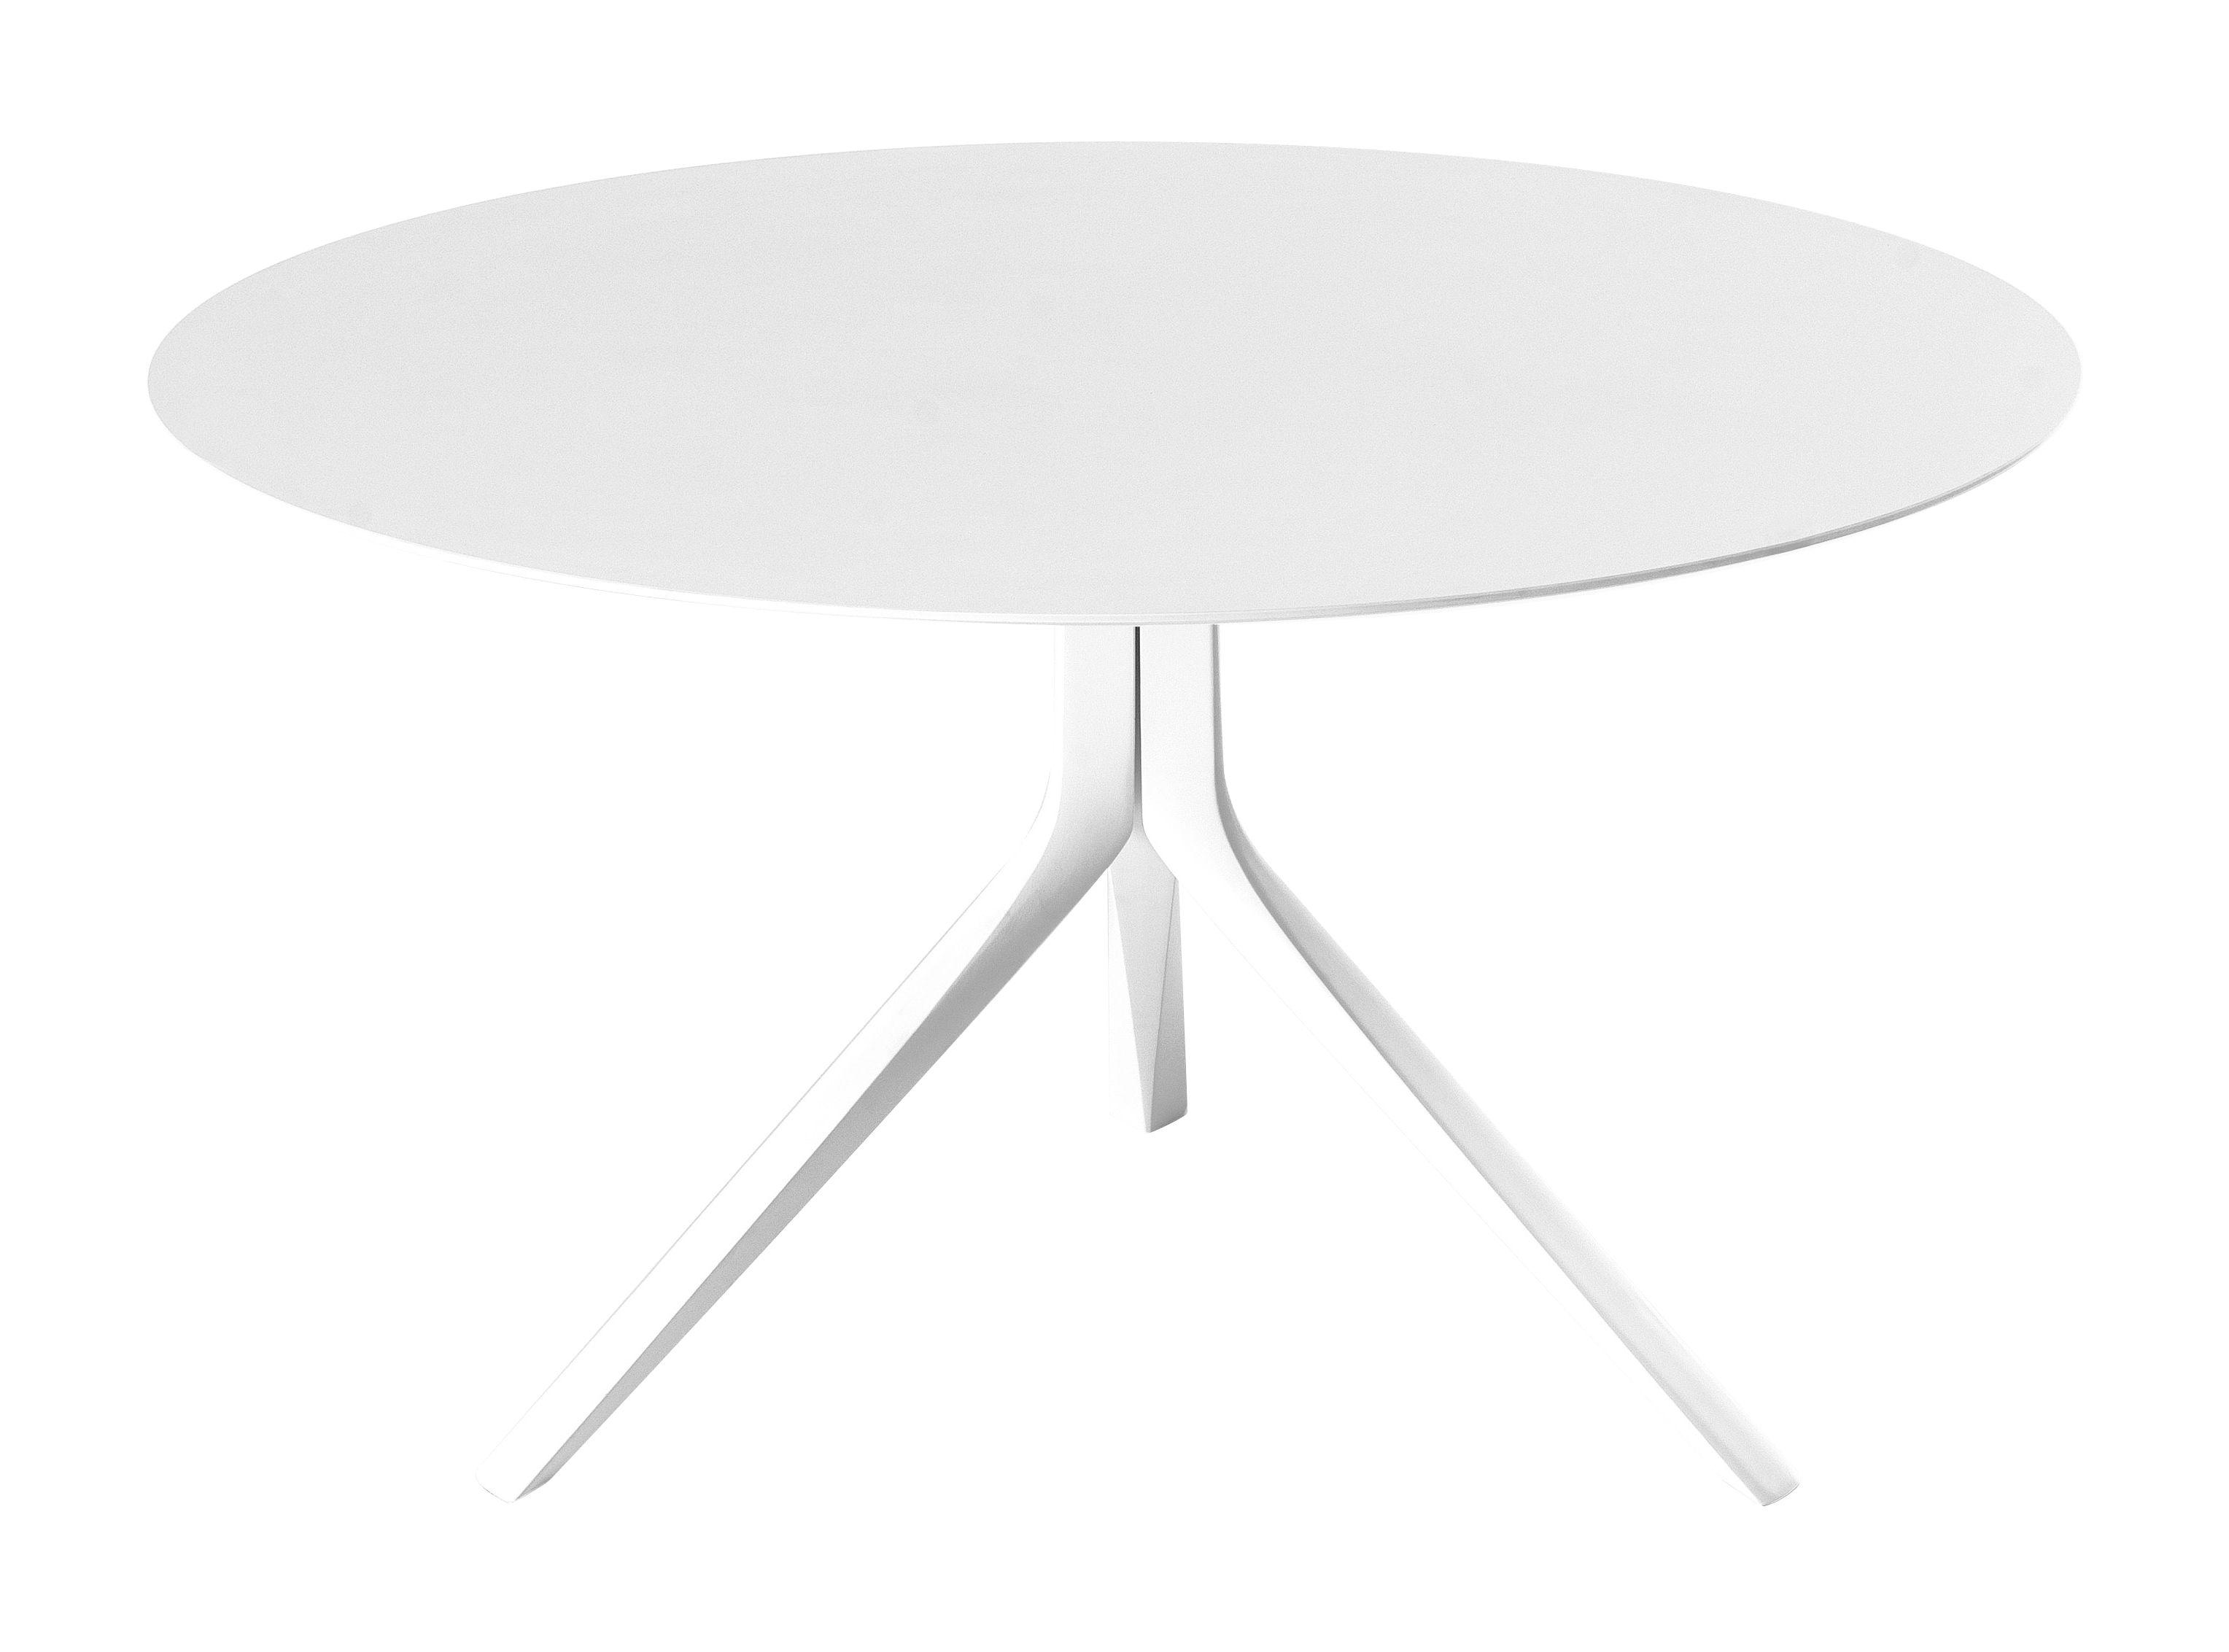 Outdoor - Tables de jardin - Table ronde Oops I did it again / Ø 120 cm - Kristalia - Blanc / Pieds blancs - Aluminium laqué, Stratifié